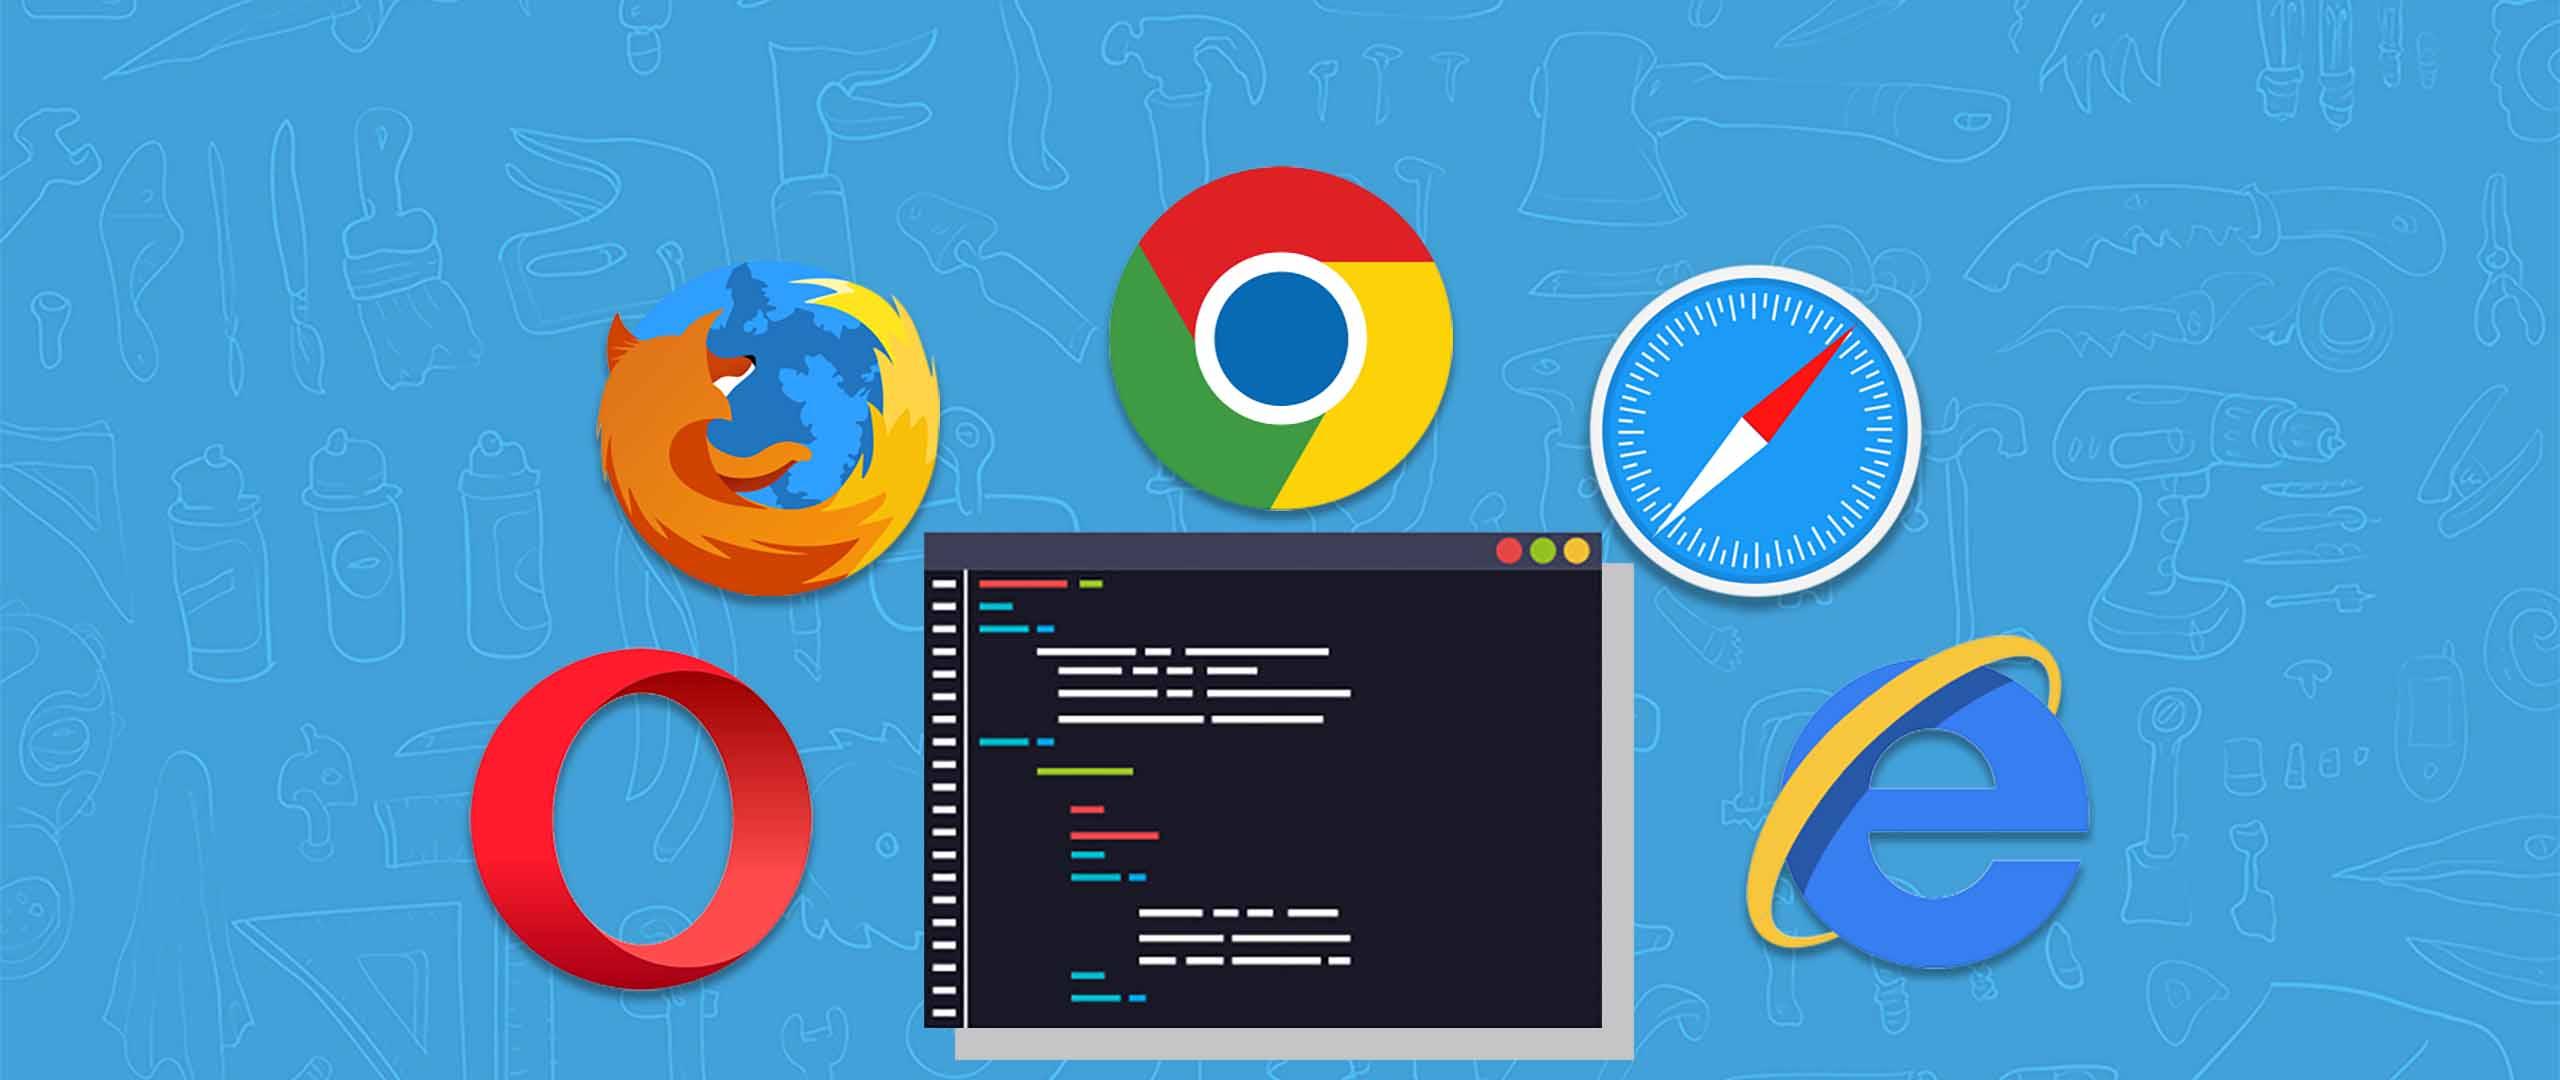 Cross Browser Compatibility Web Design